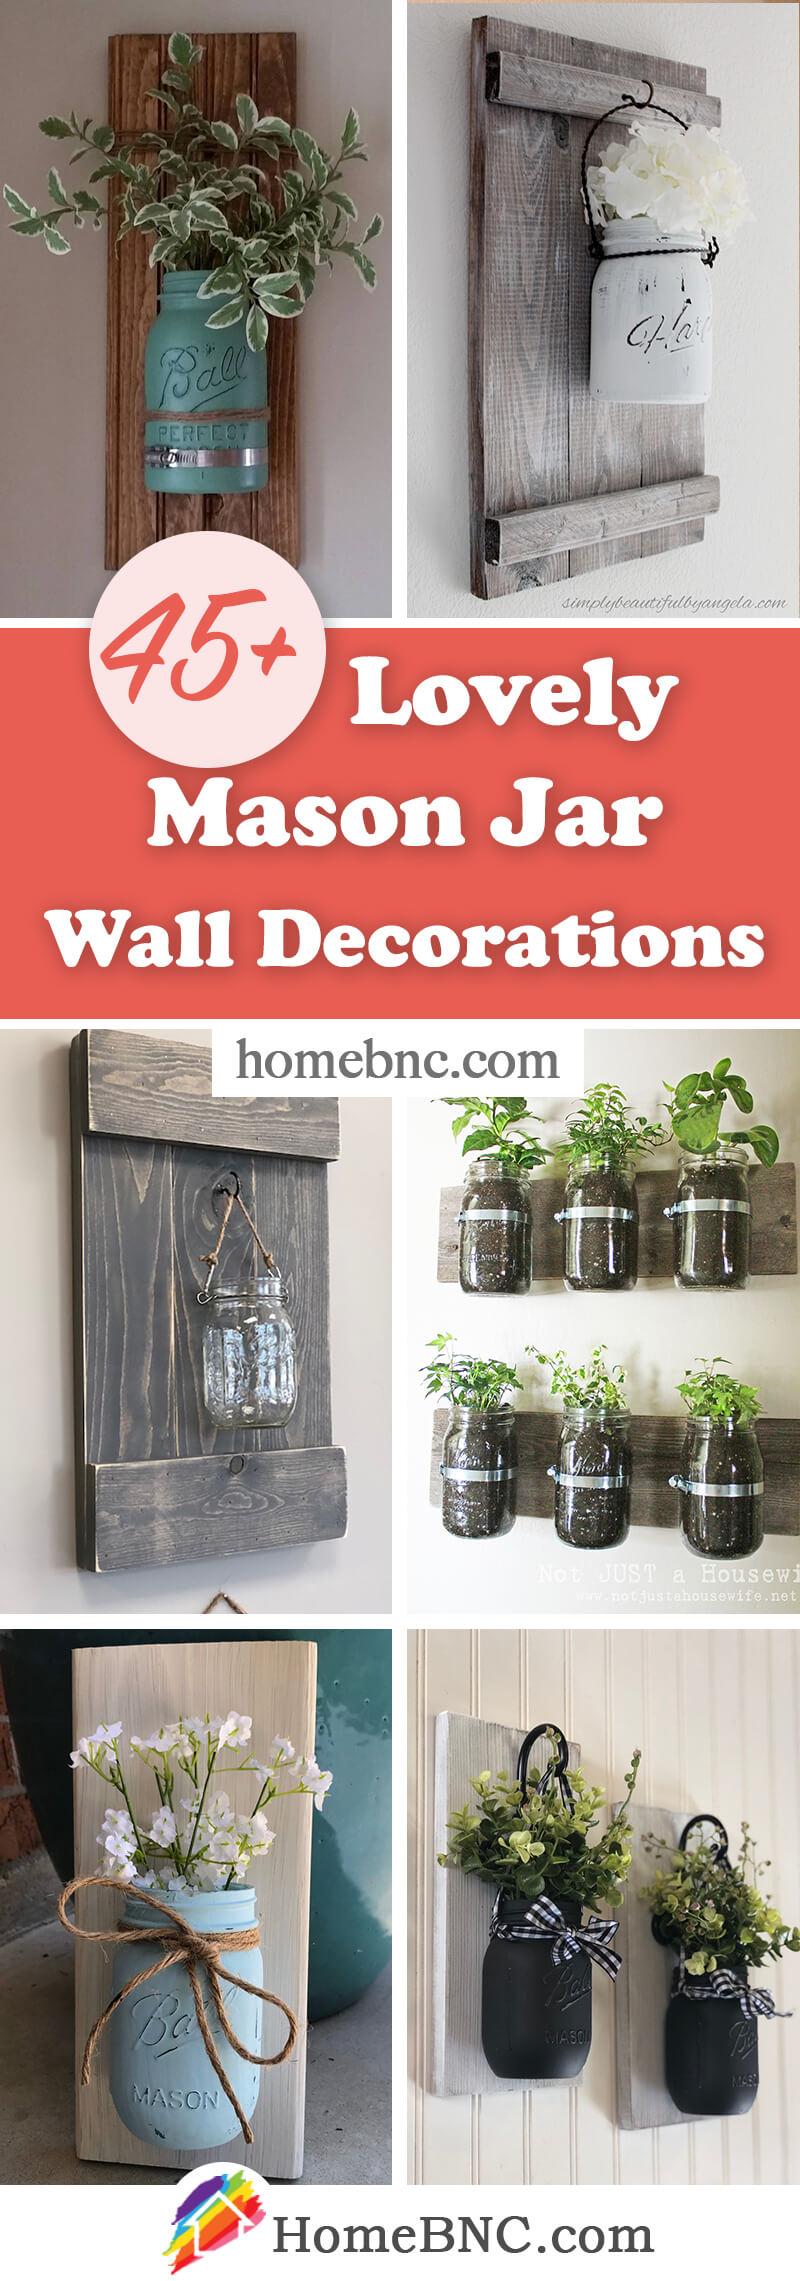 Mason Jar Wall Decorations